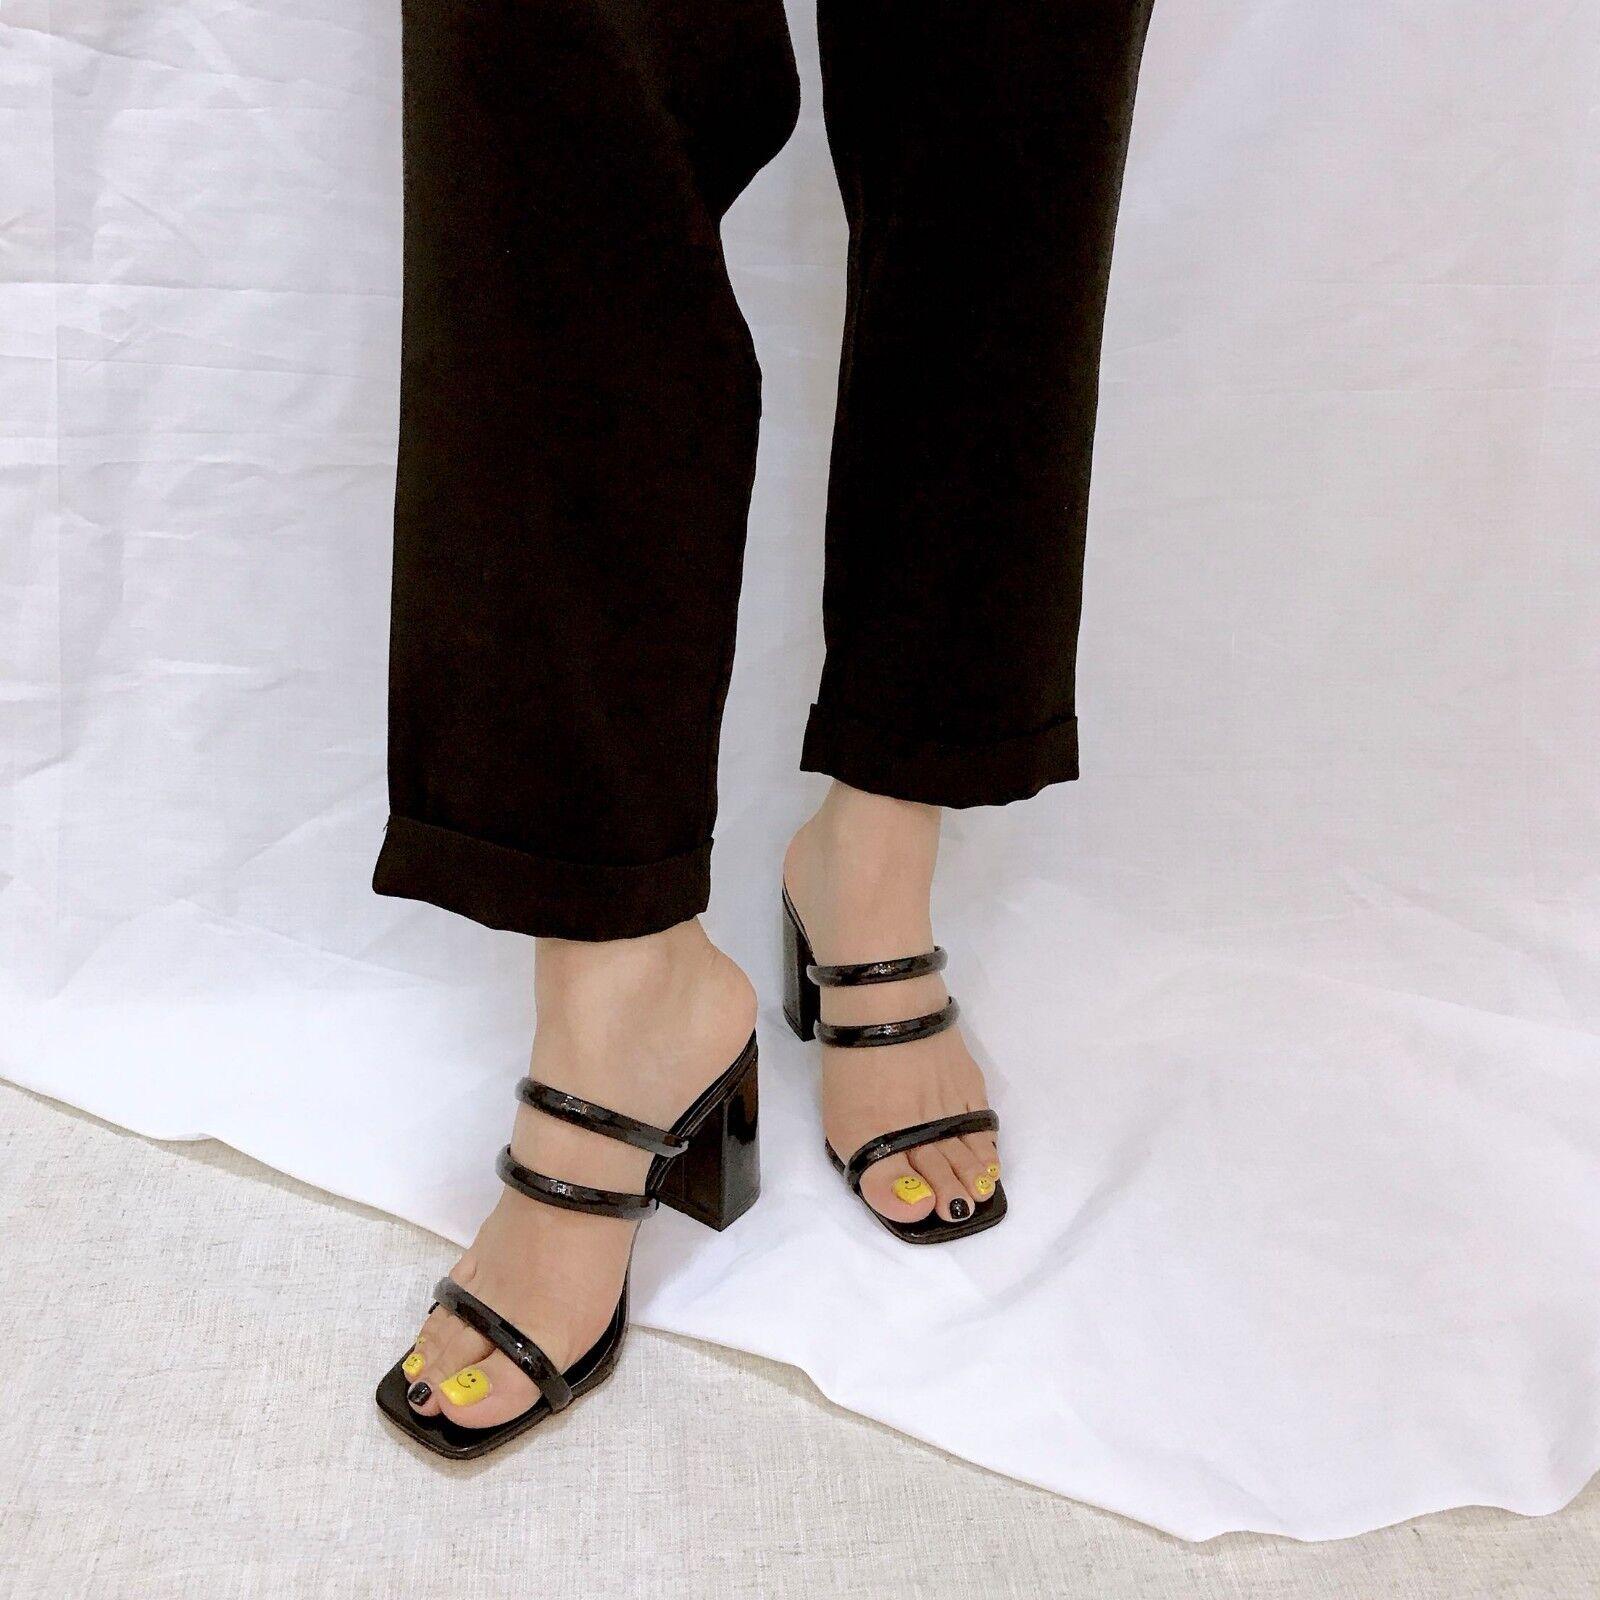 Moda barata y hermosa sandali 7 cm eleganti nero lucido tacco quadrato sandali simil pelle 1098